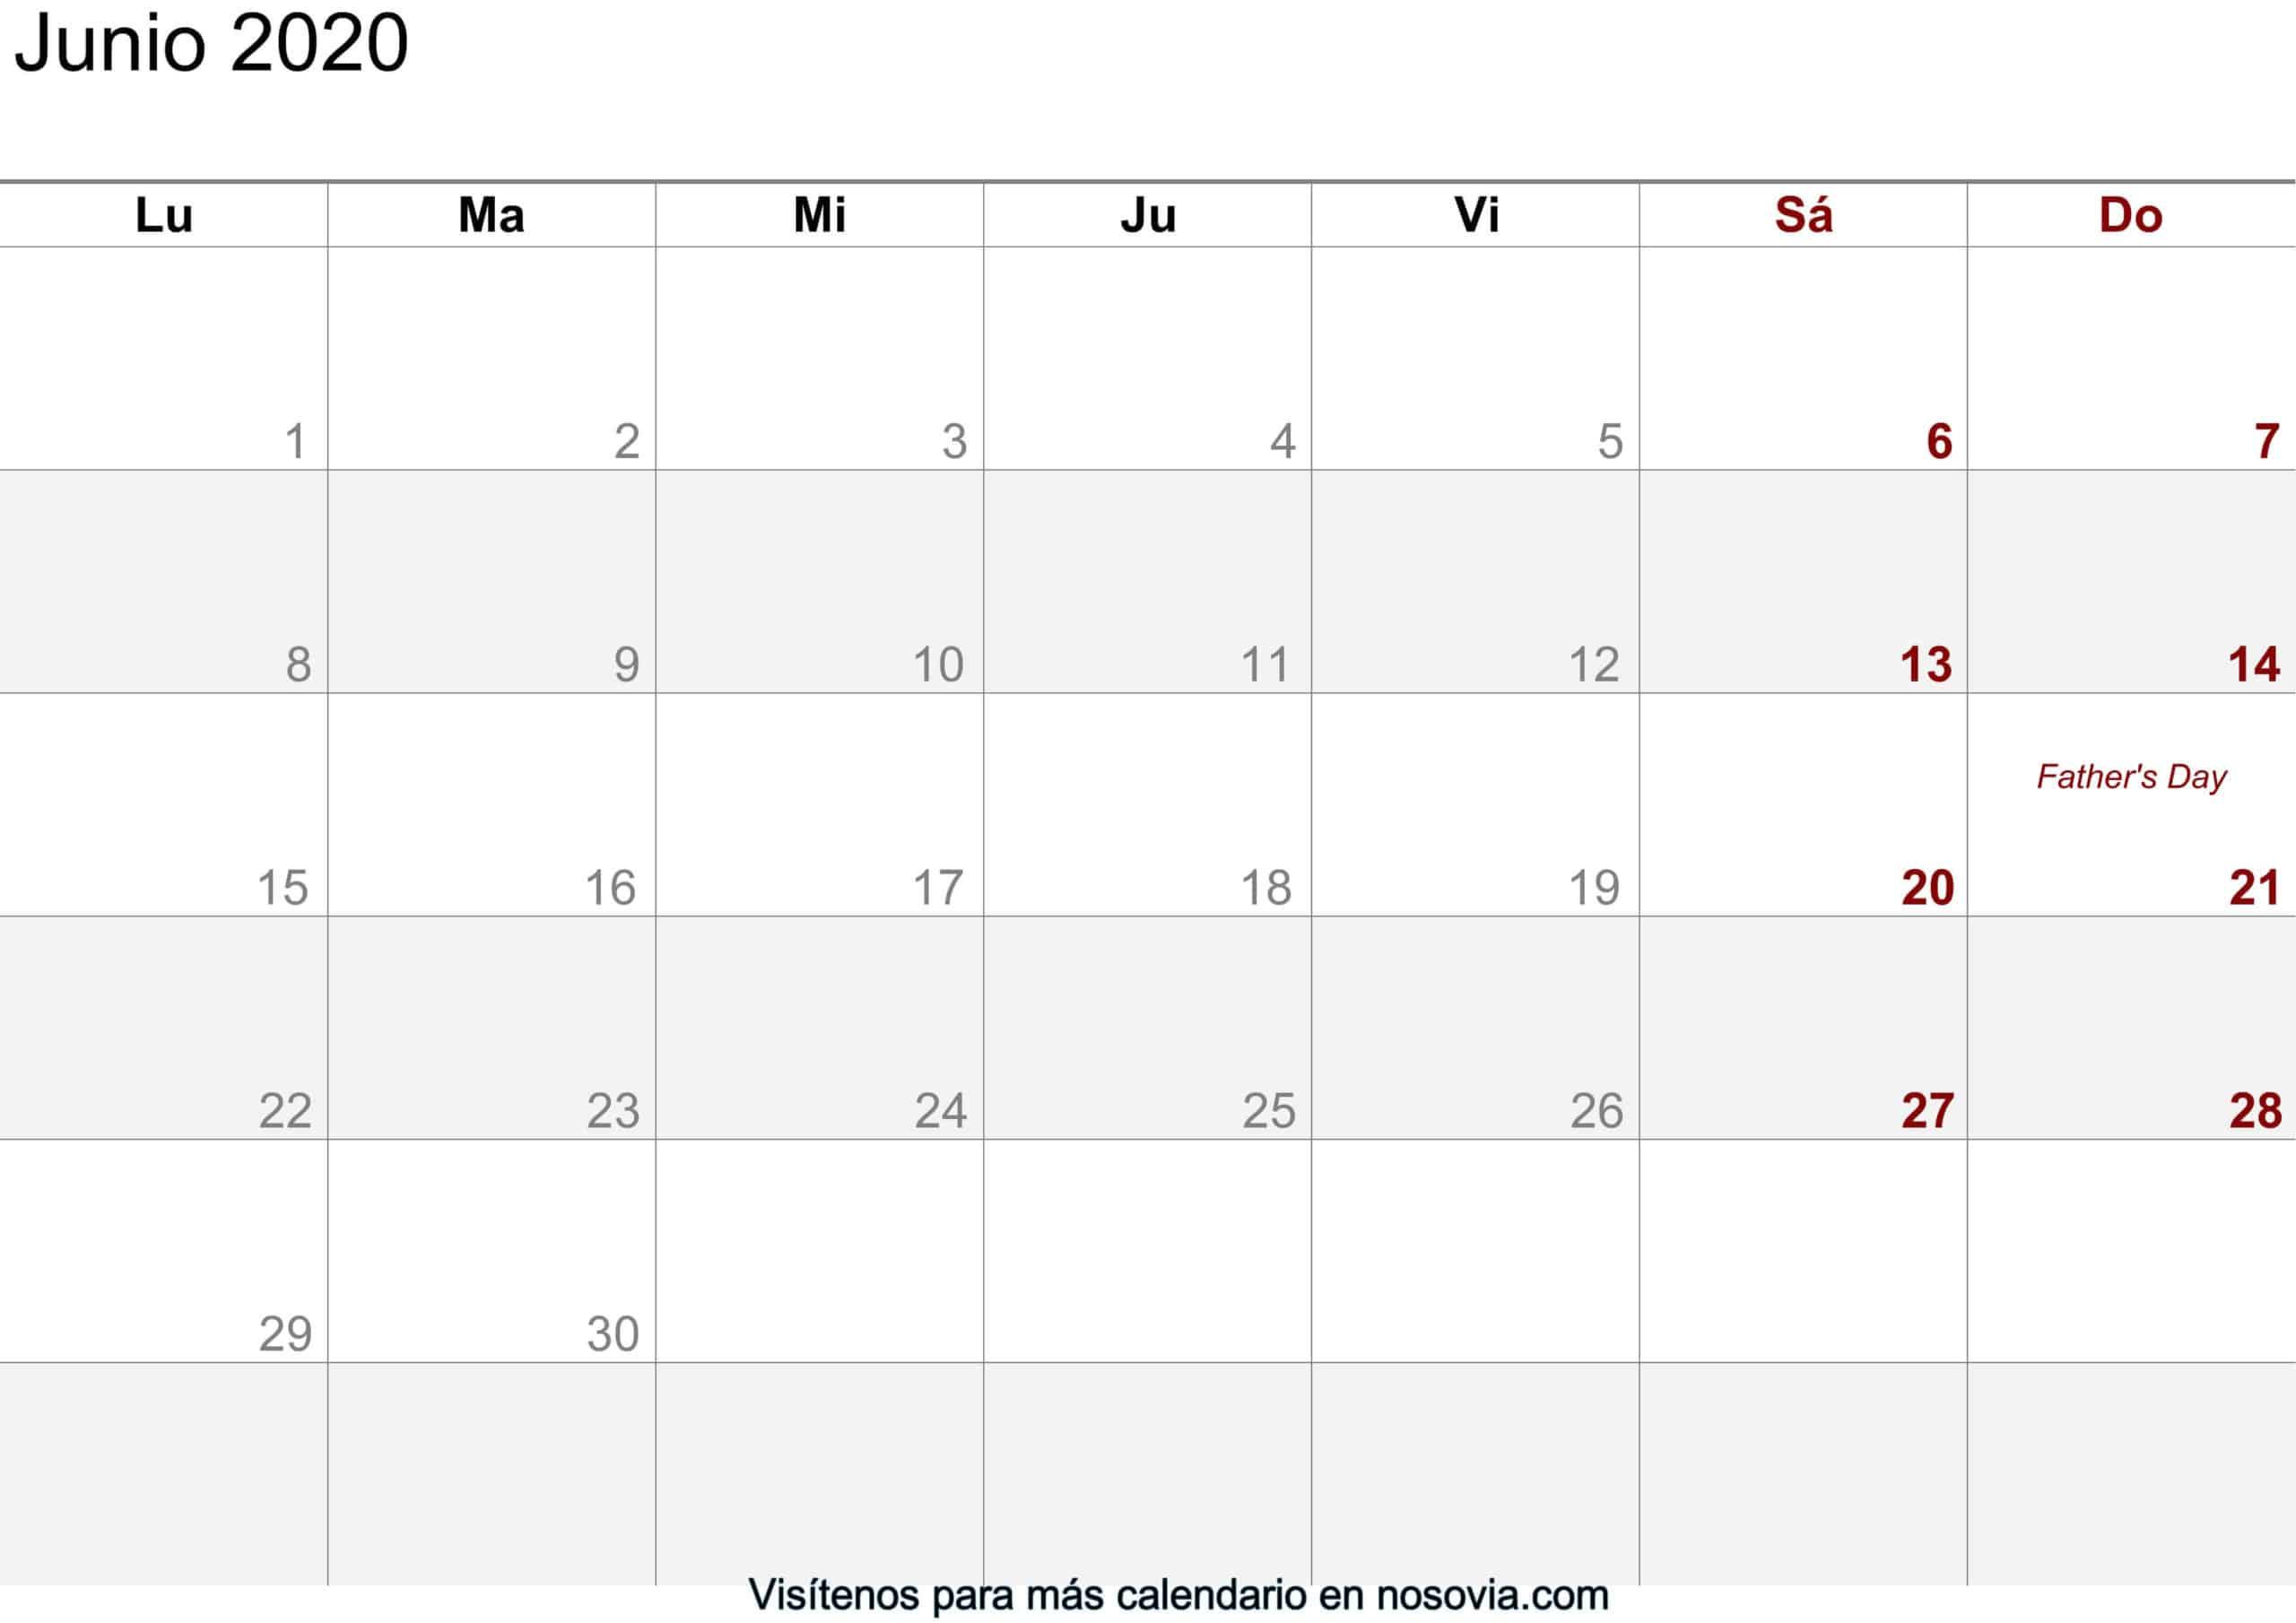 Calendario-junio-2020-imágenes-para-imprimir